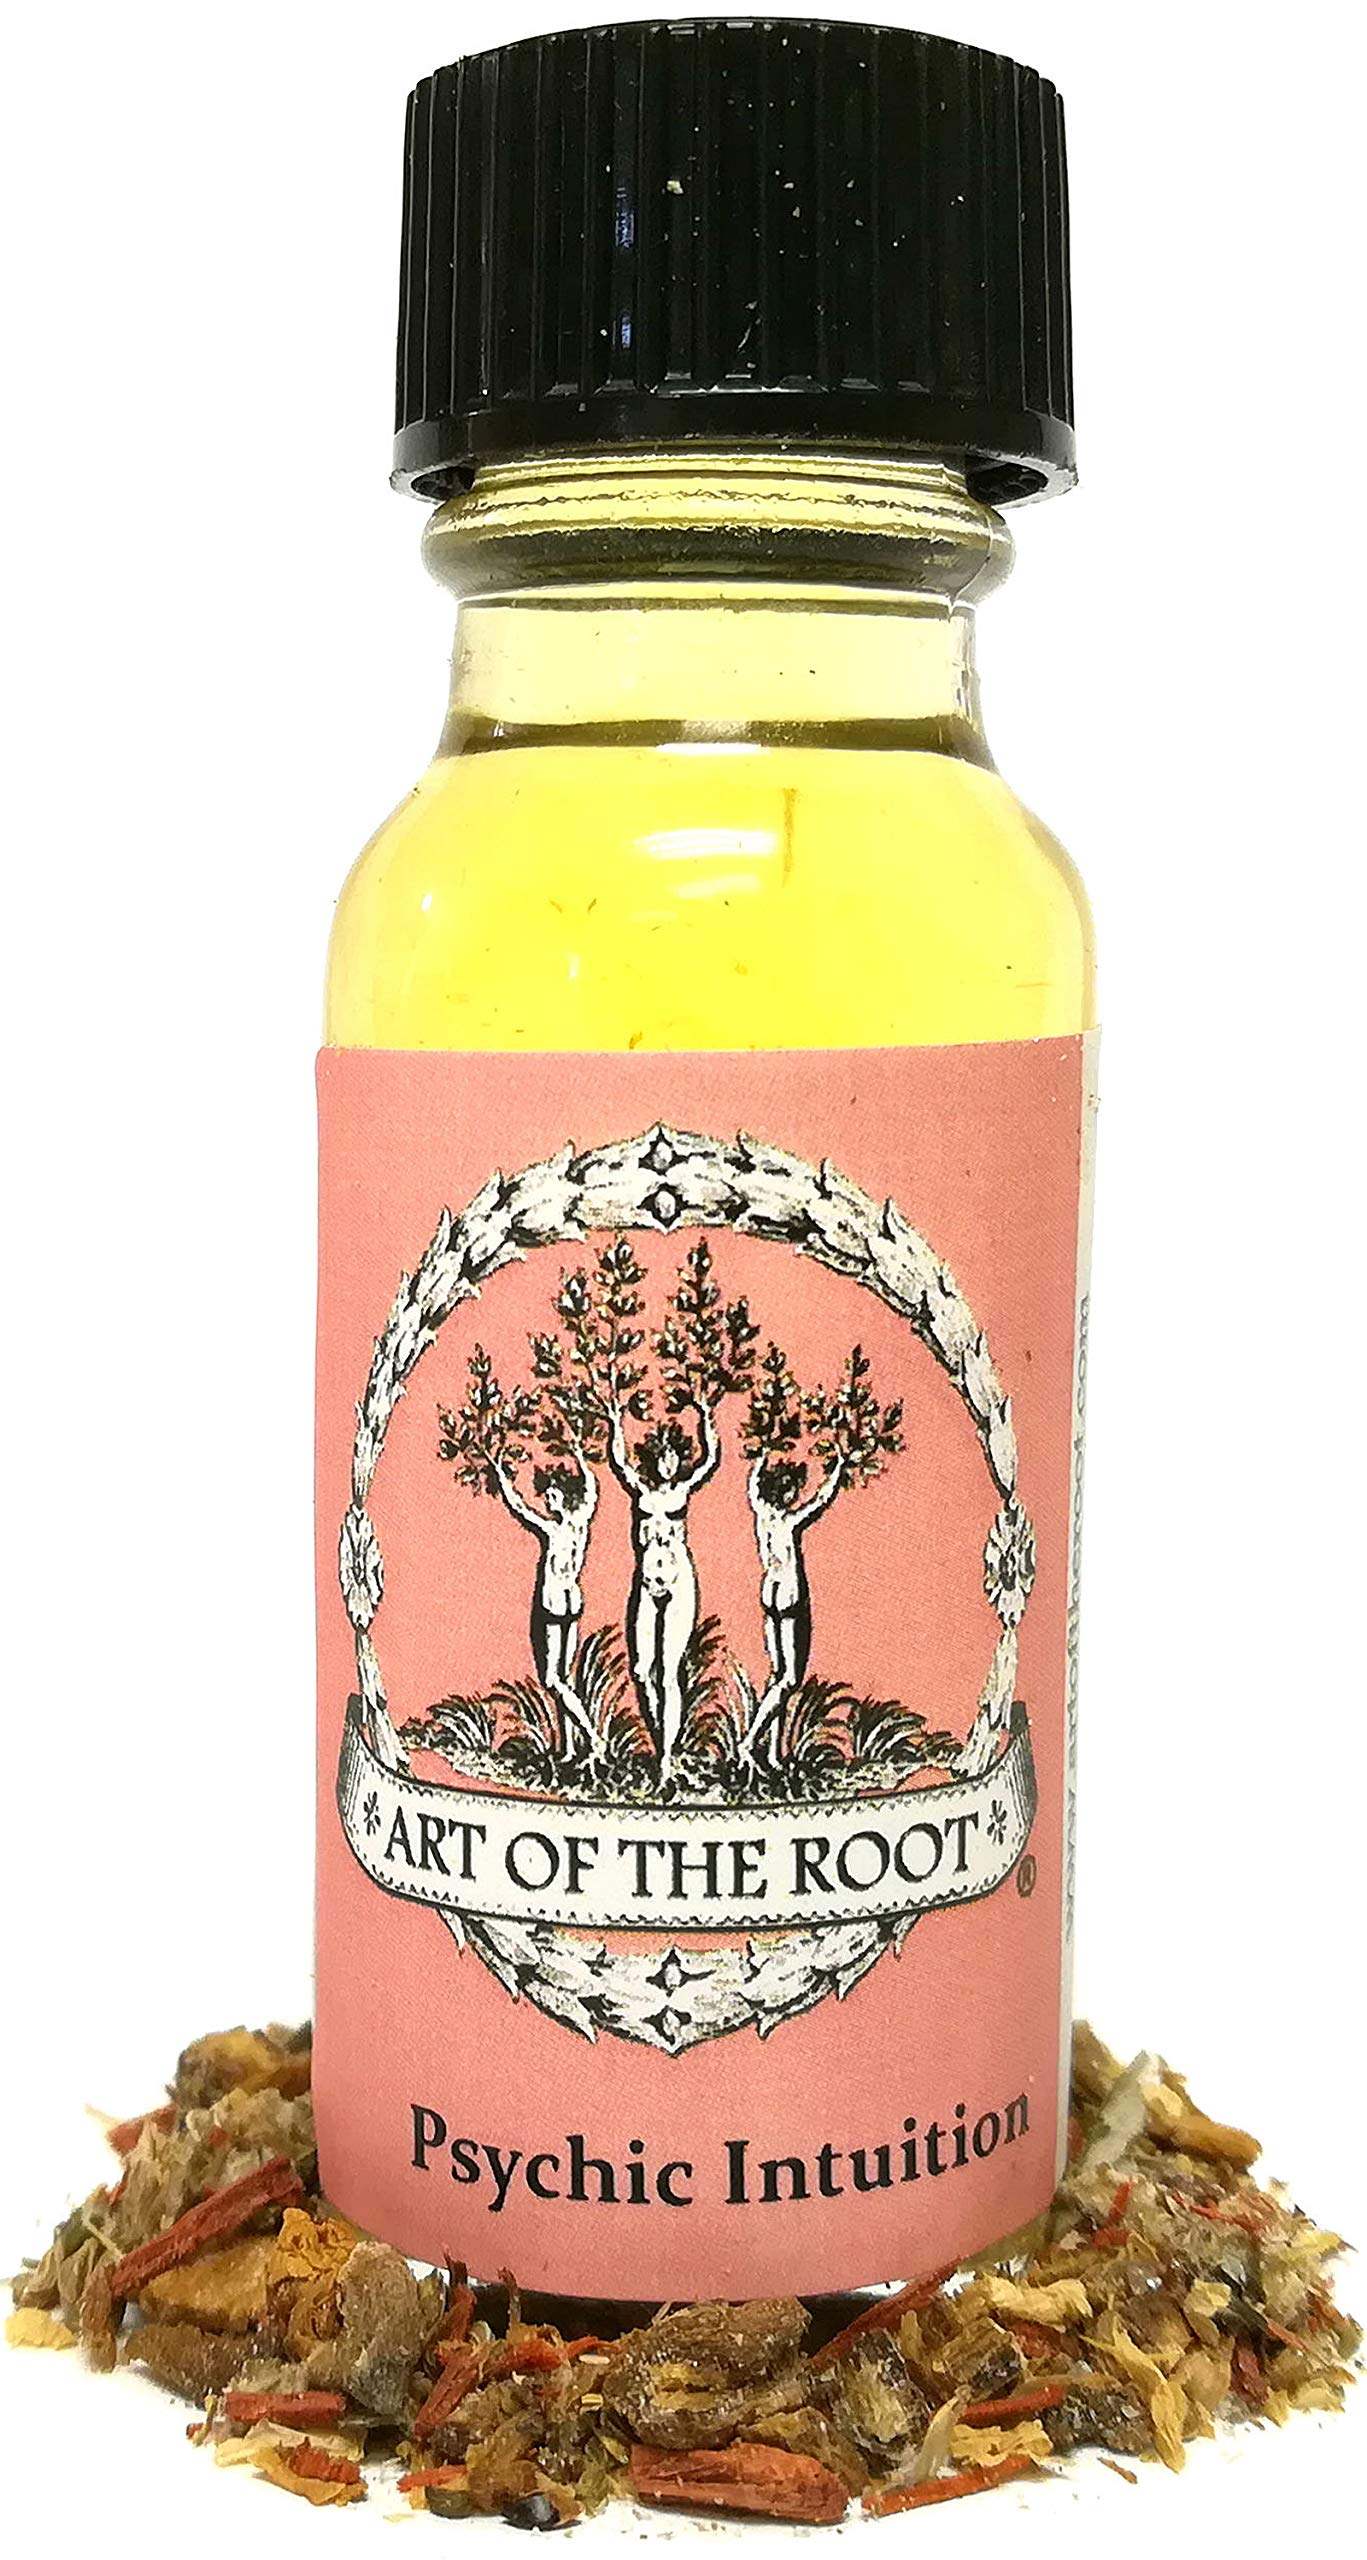 Psychic Intuition Oil 1/2 oz Hoodoo Voodoo Wicca Pagan Santeria